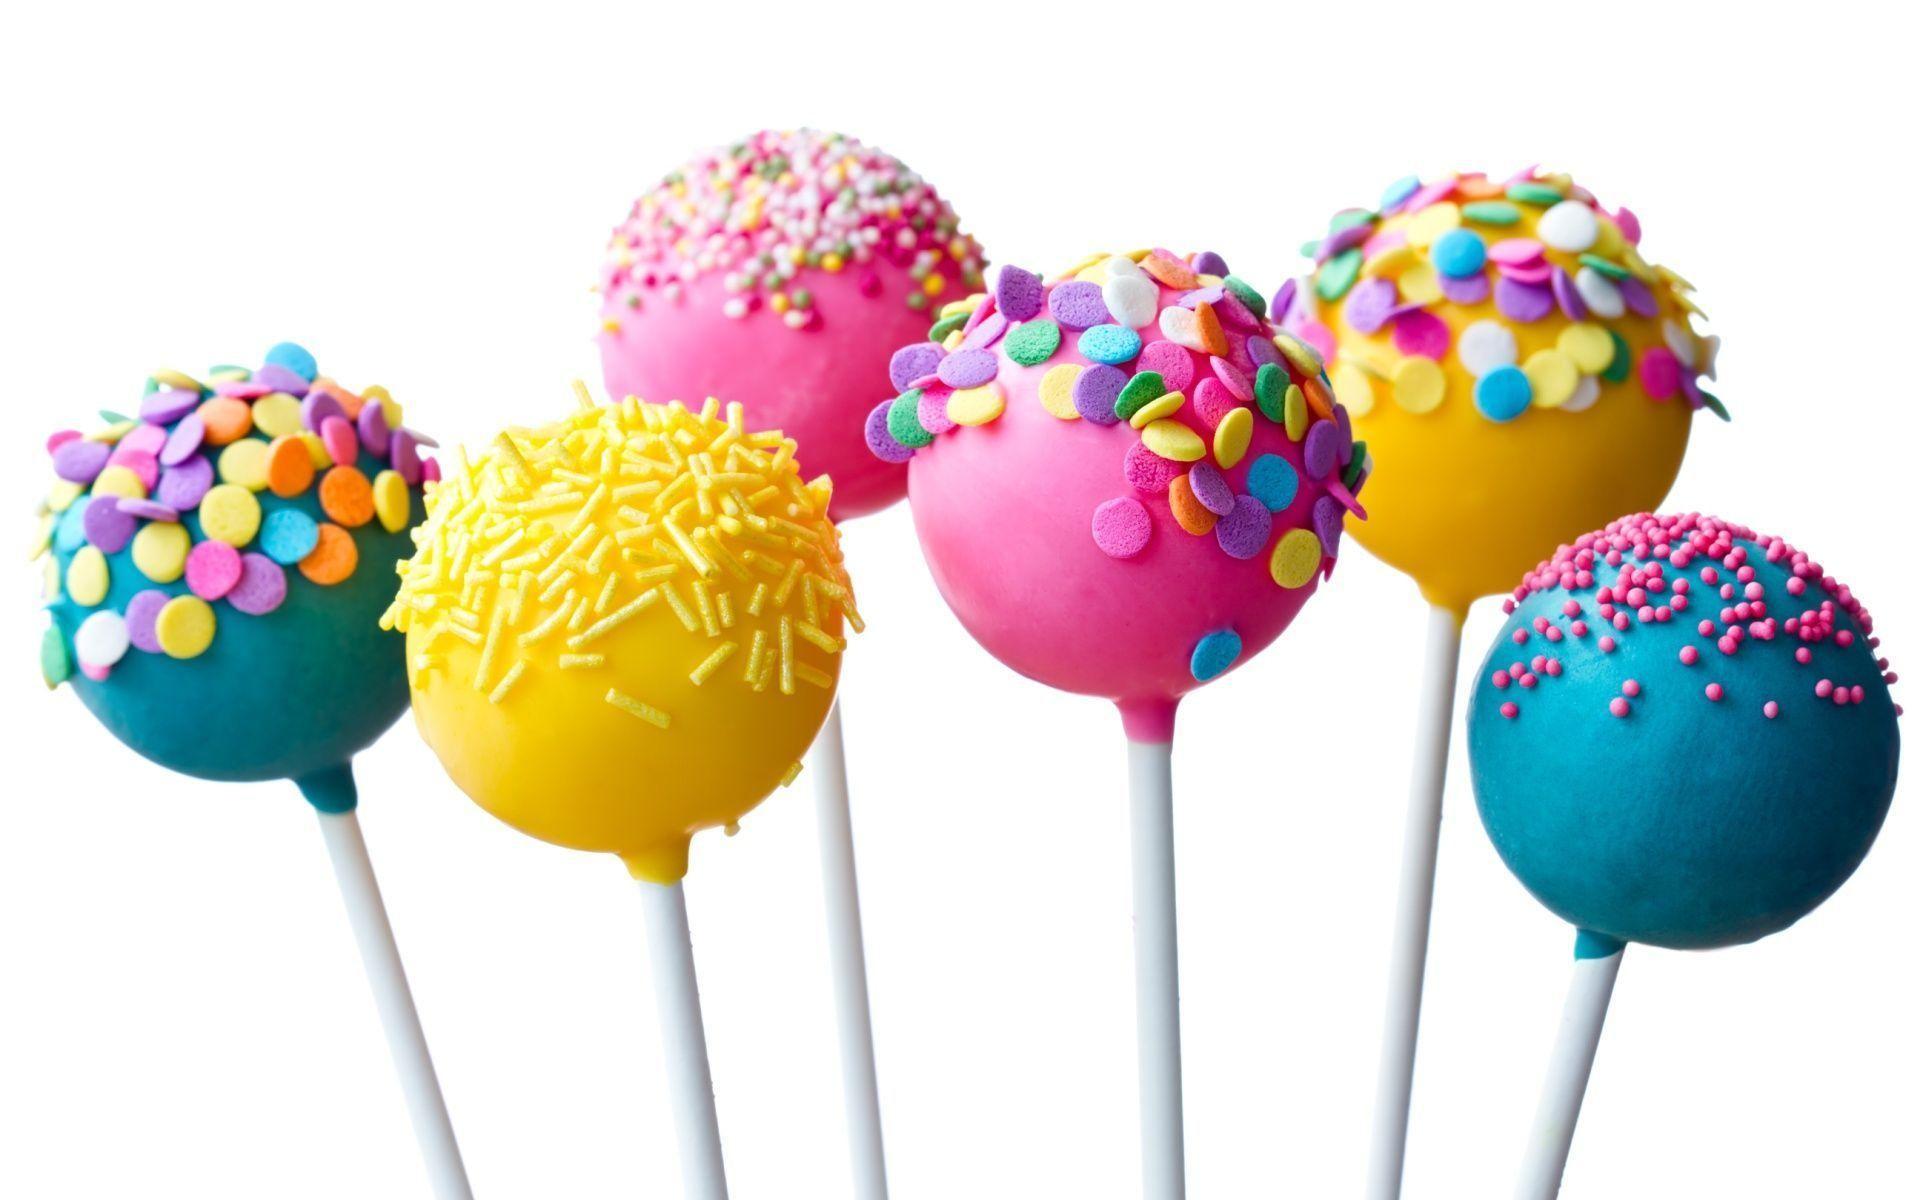 Res: 1920x1200, Cute Candy Wallpaper - Tuffboys.com